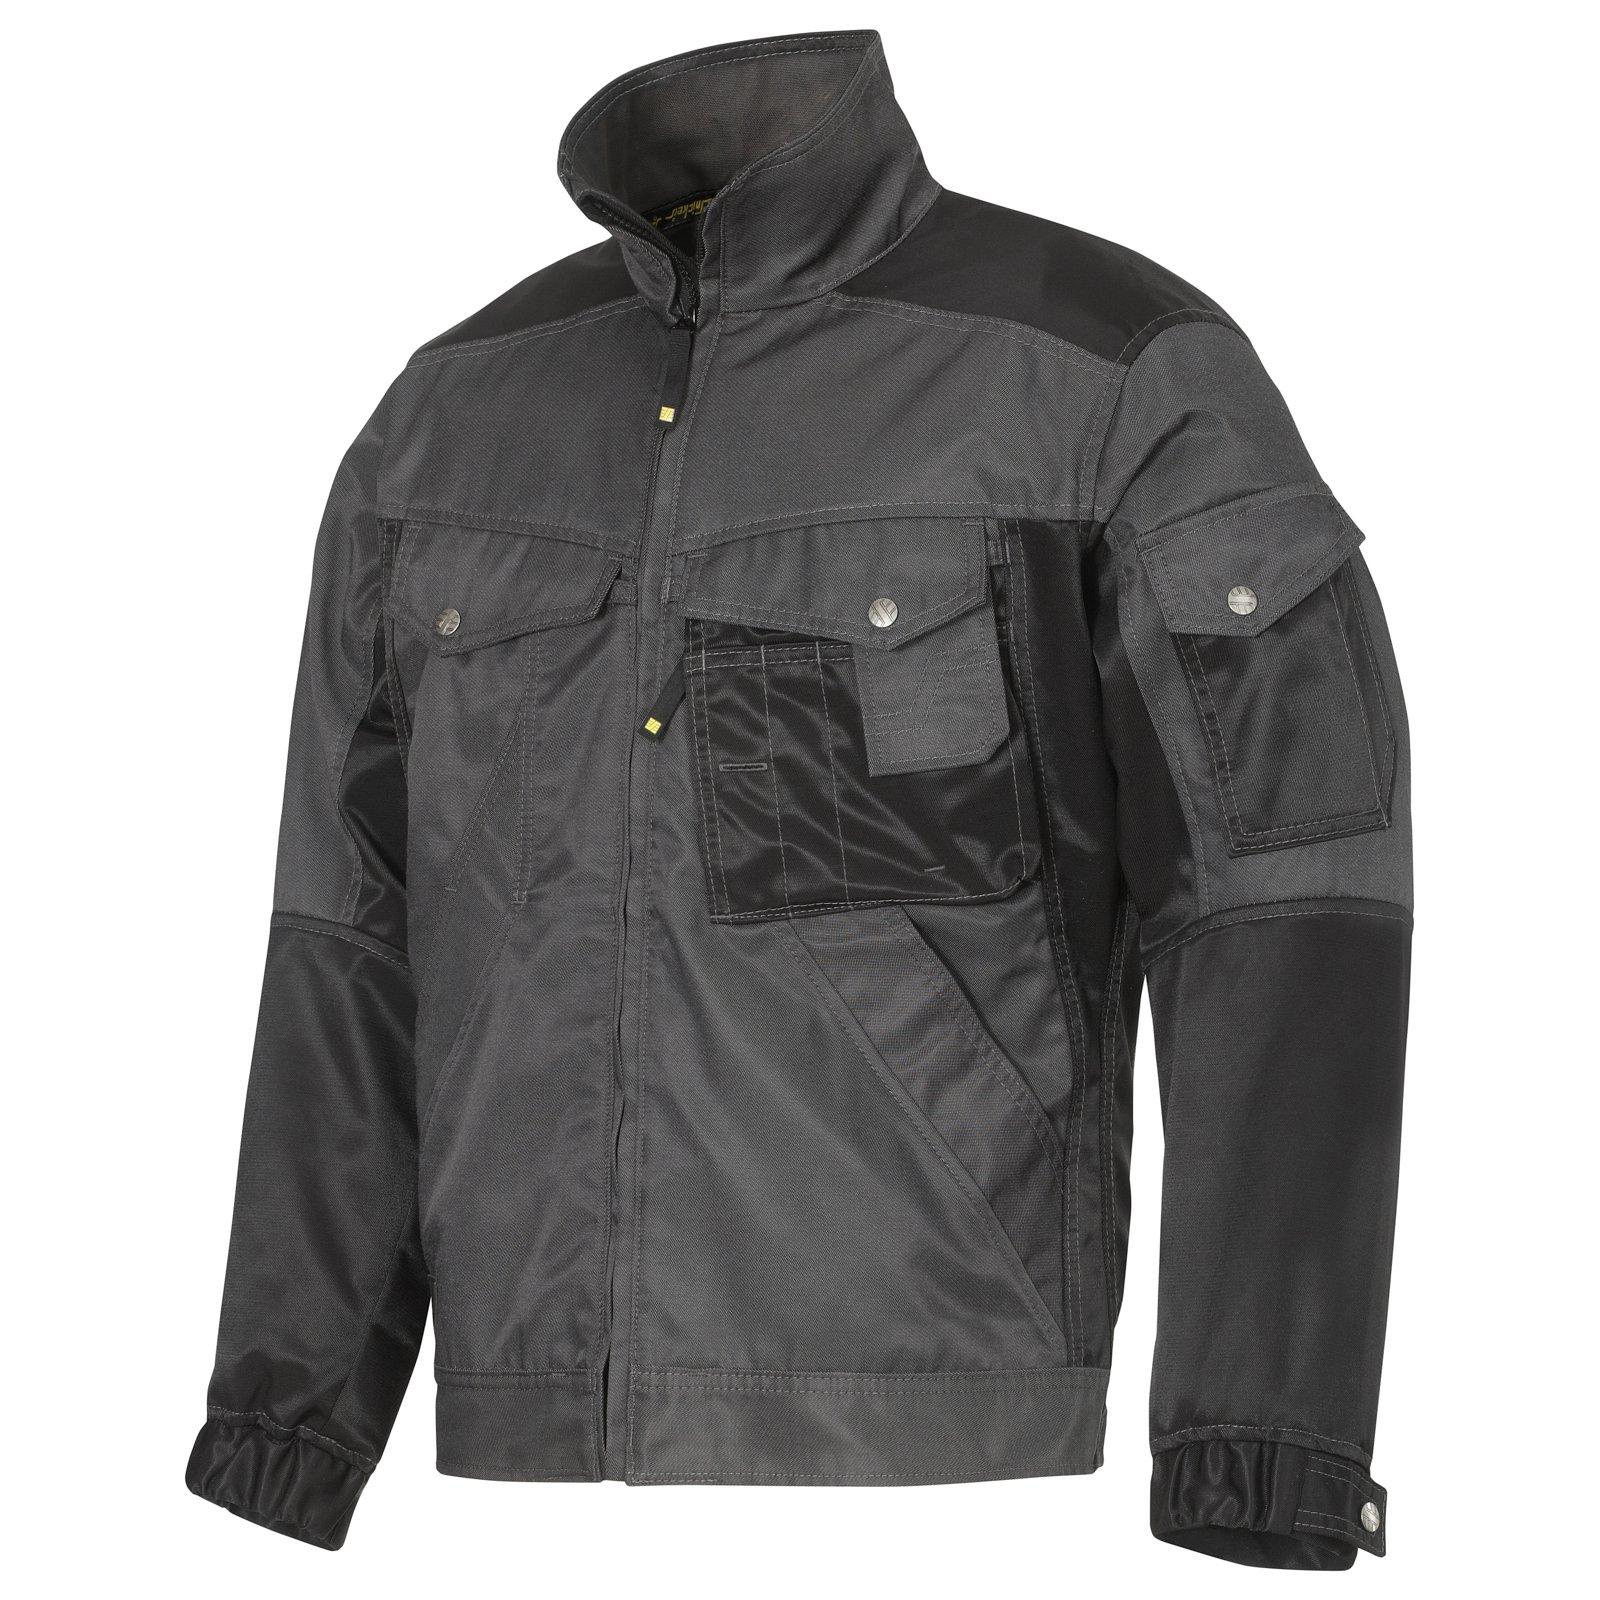 dd0bbc86e37 1512 Craftsmen Jacket, DuraTwill - Atlantic Safety Wear